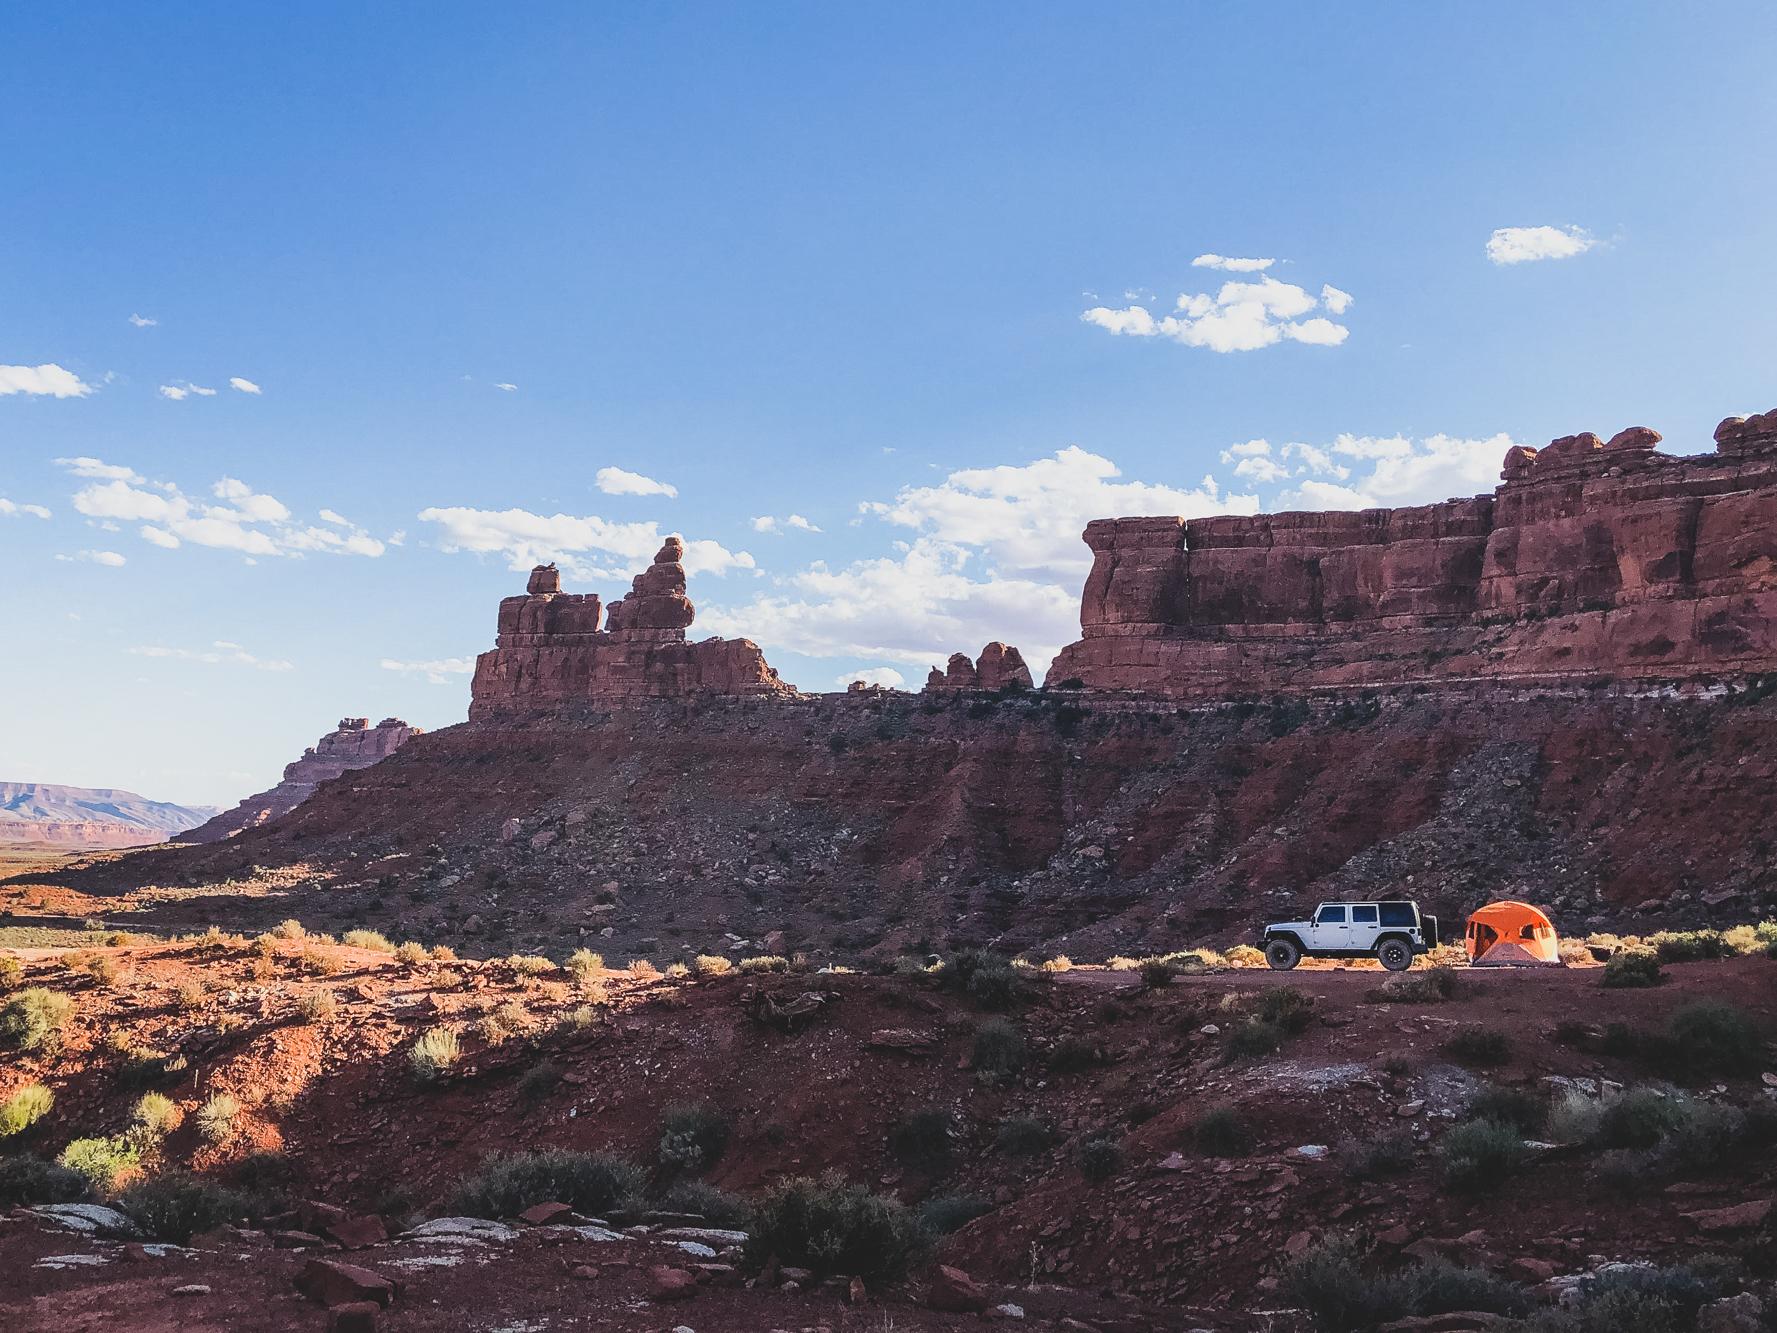 Gazelle T4 Hub Tent - Expedition Portal